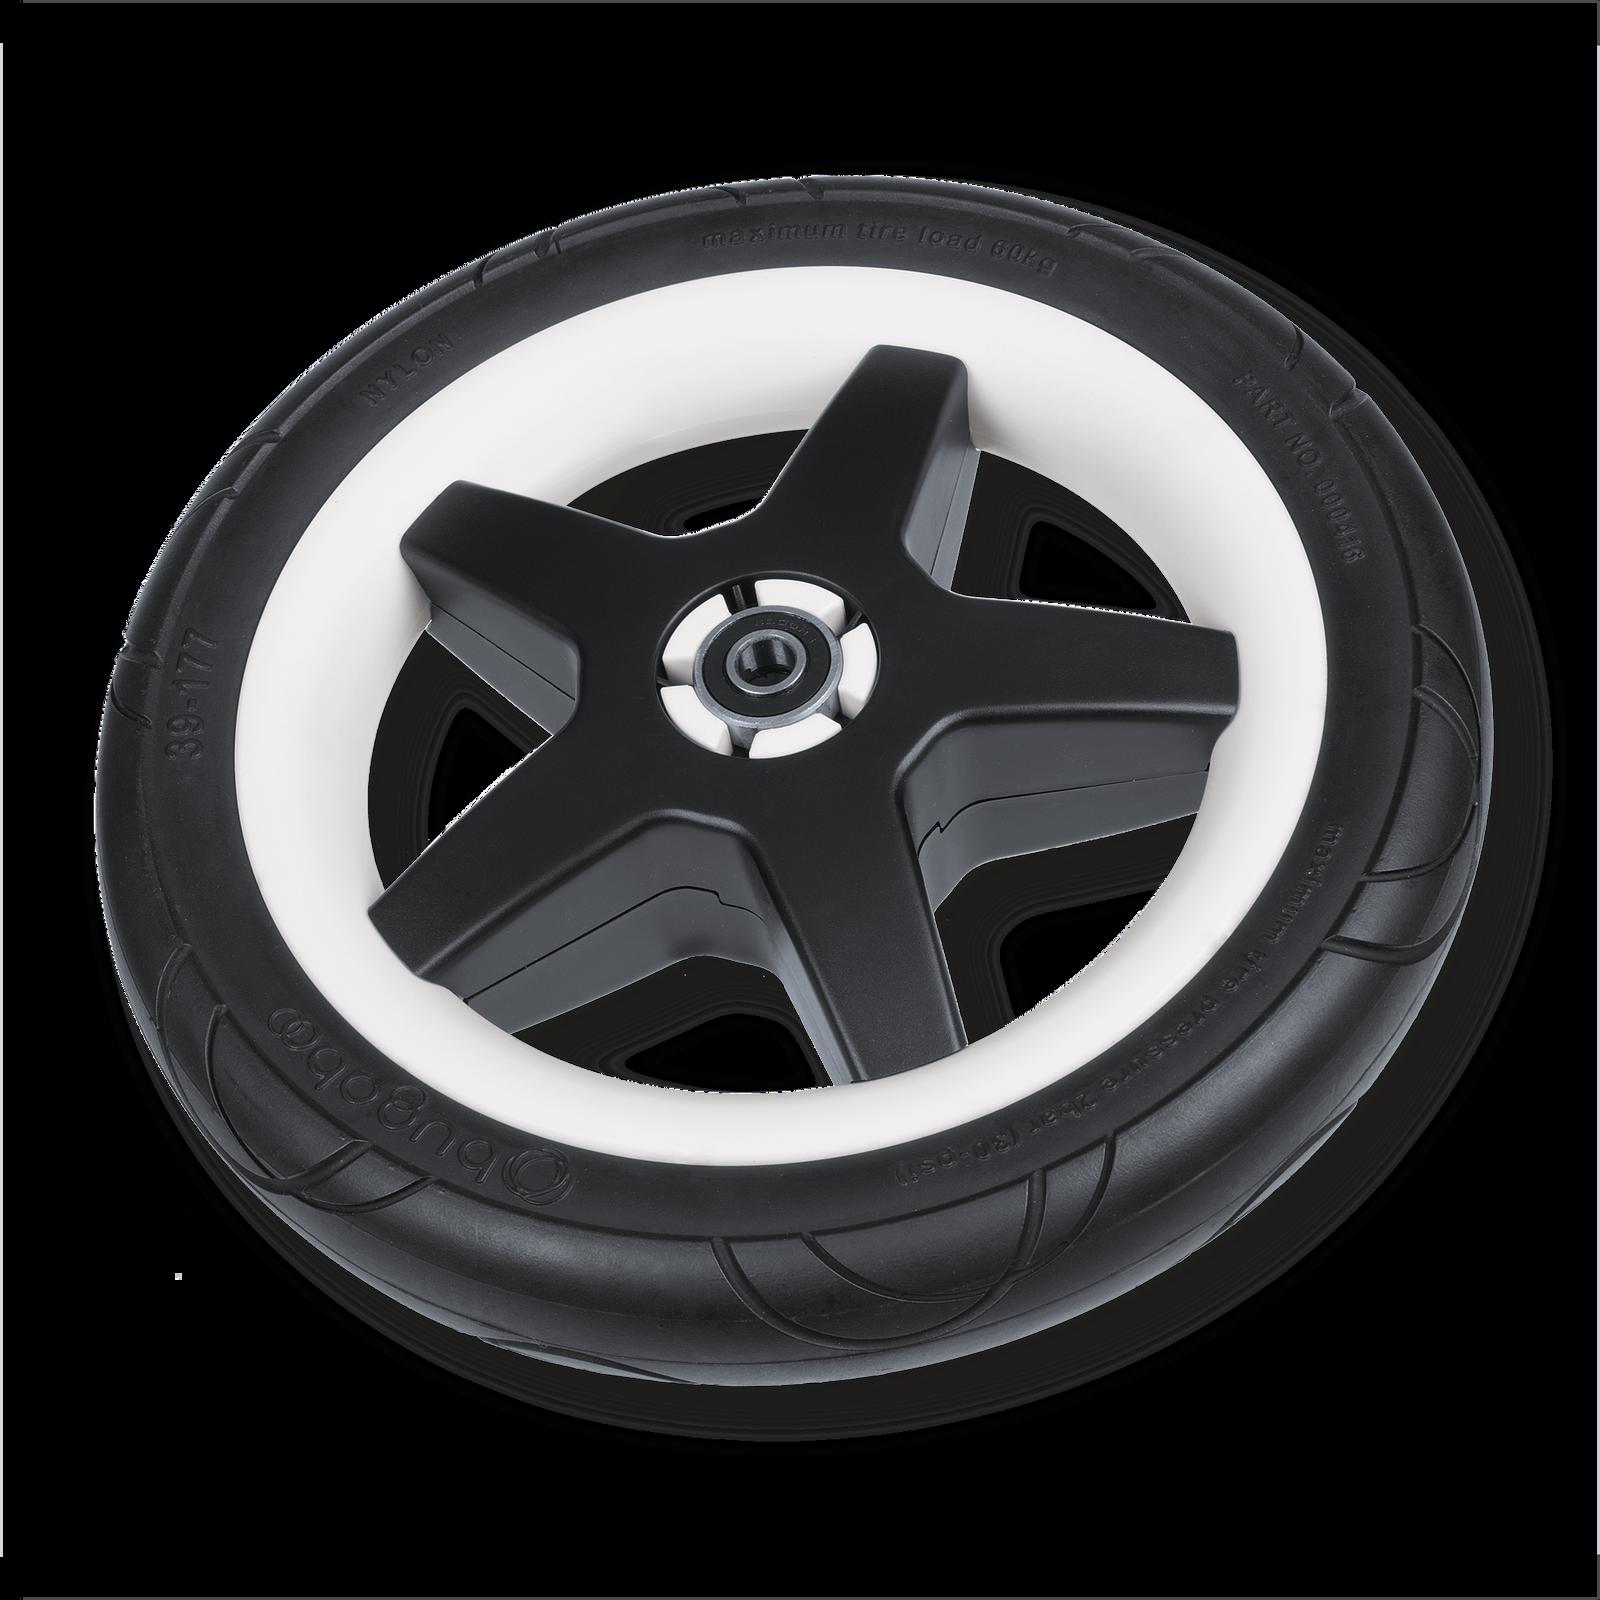 Bugaboo Donkey/Buffalo 10 inch front wheel